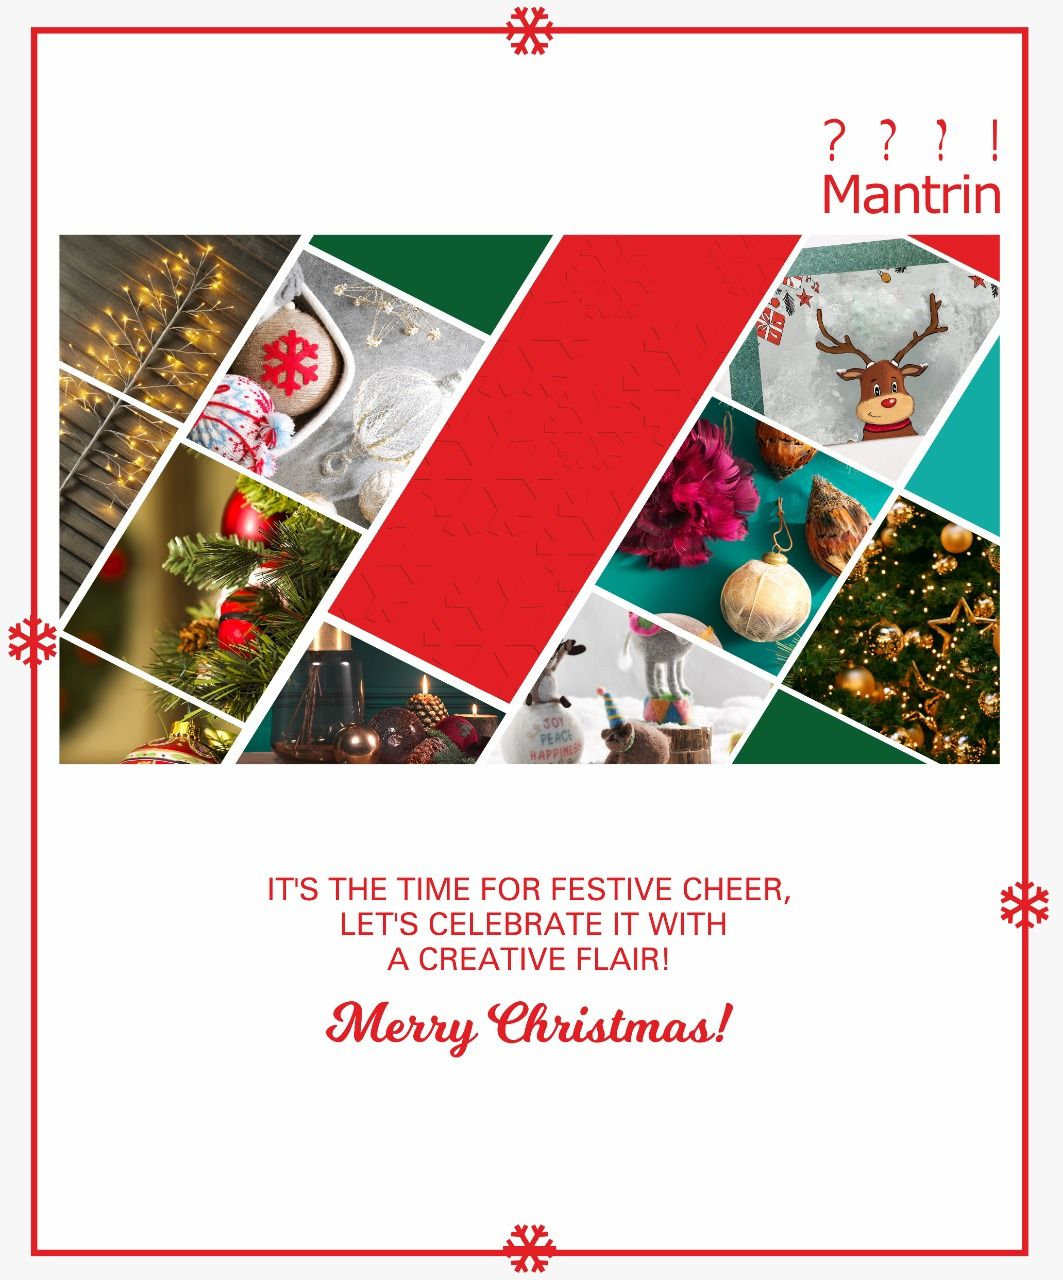 MerryChristmas Creative advertising, Web development